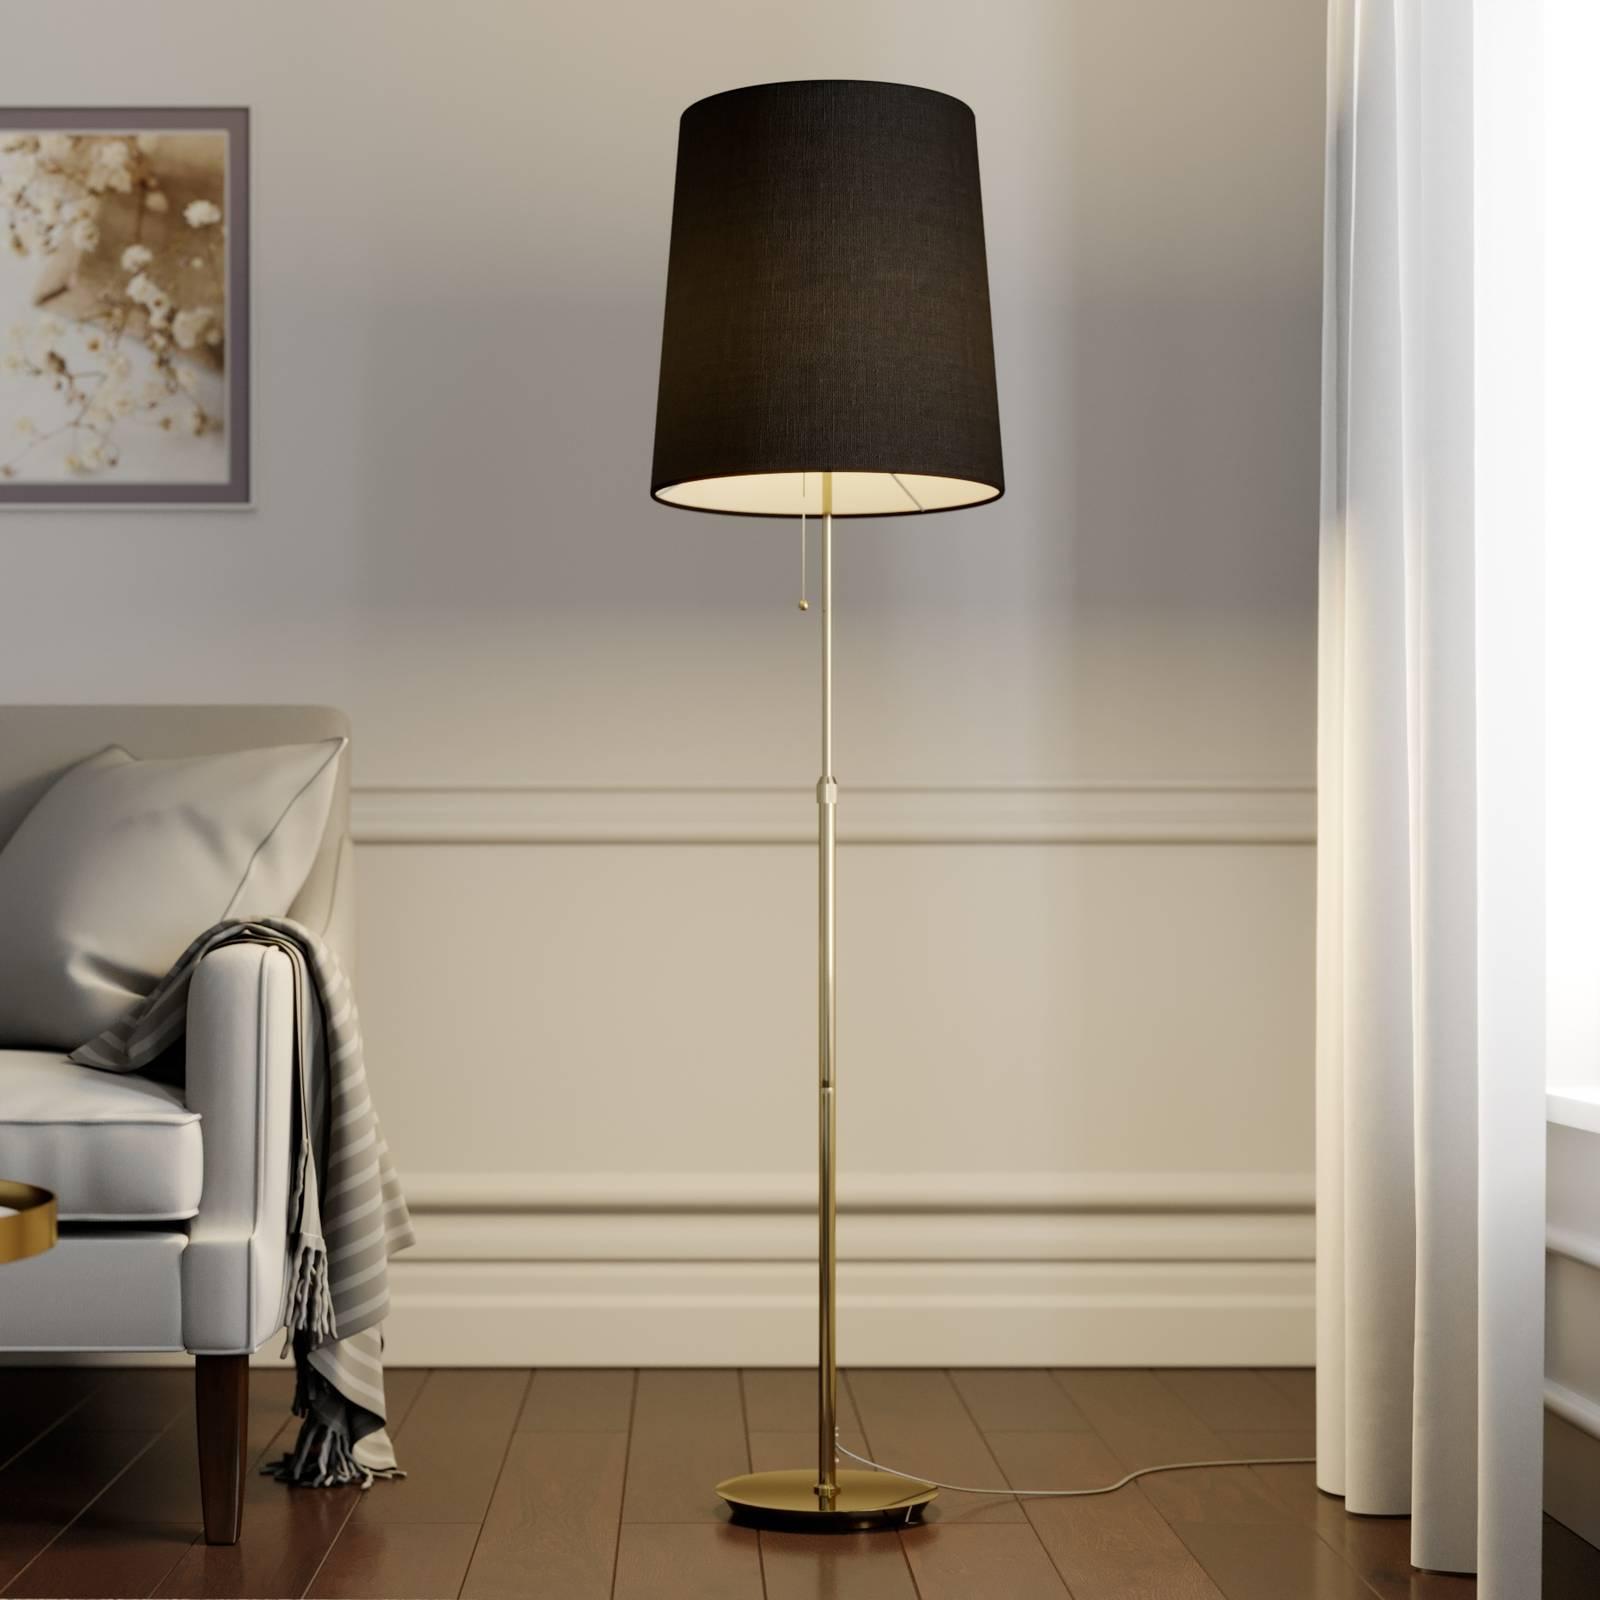 Lucande Pordis lattiavalaisin, 155 cm, messinki